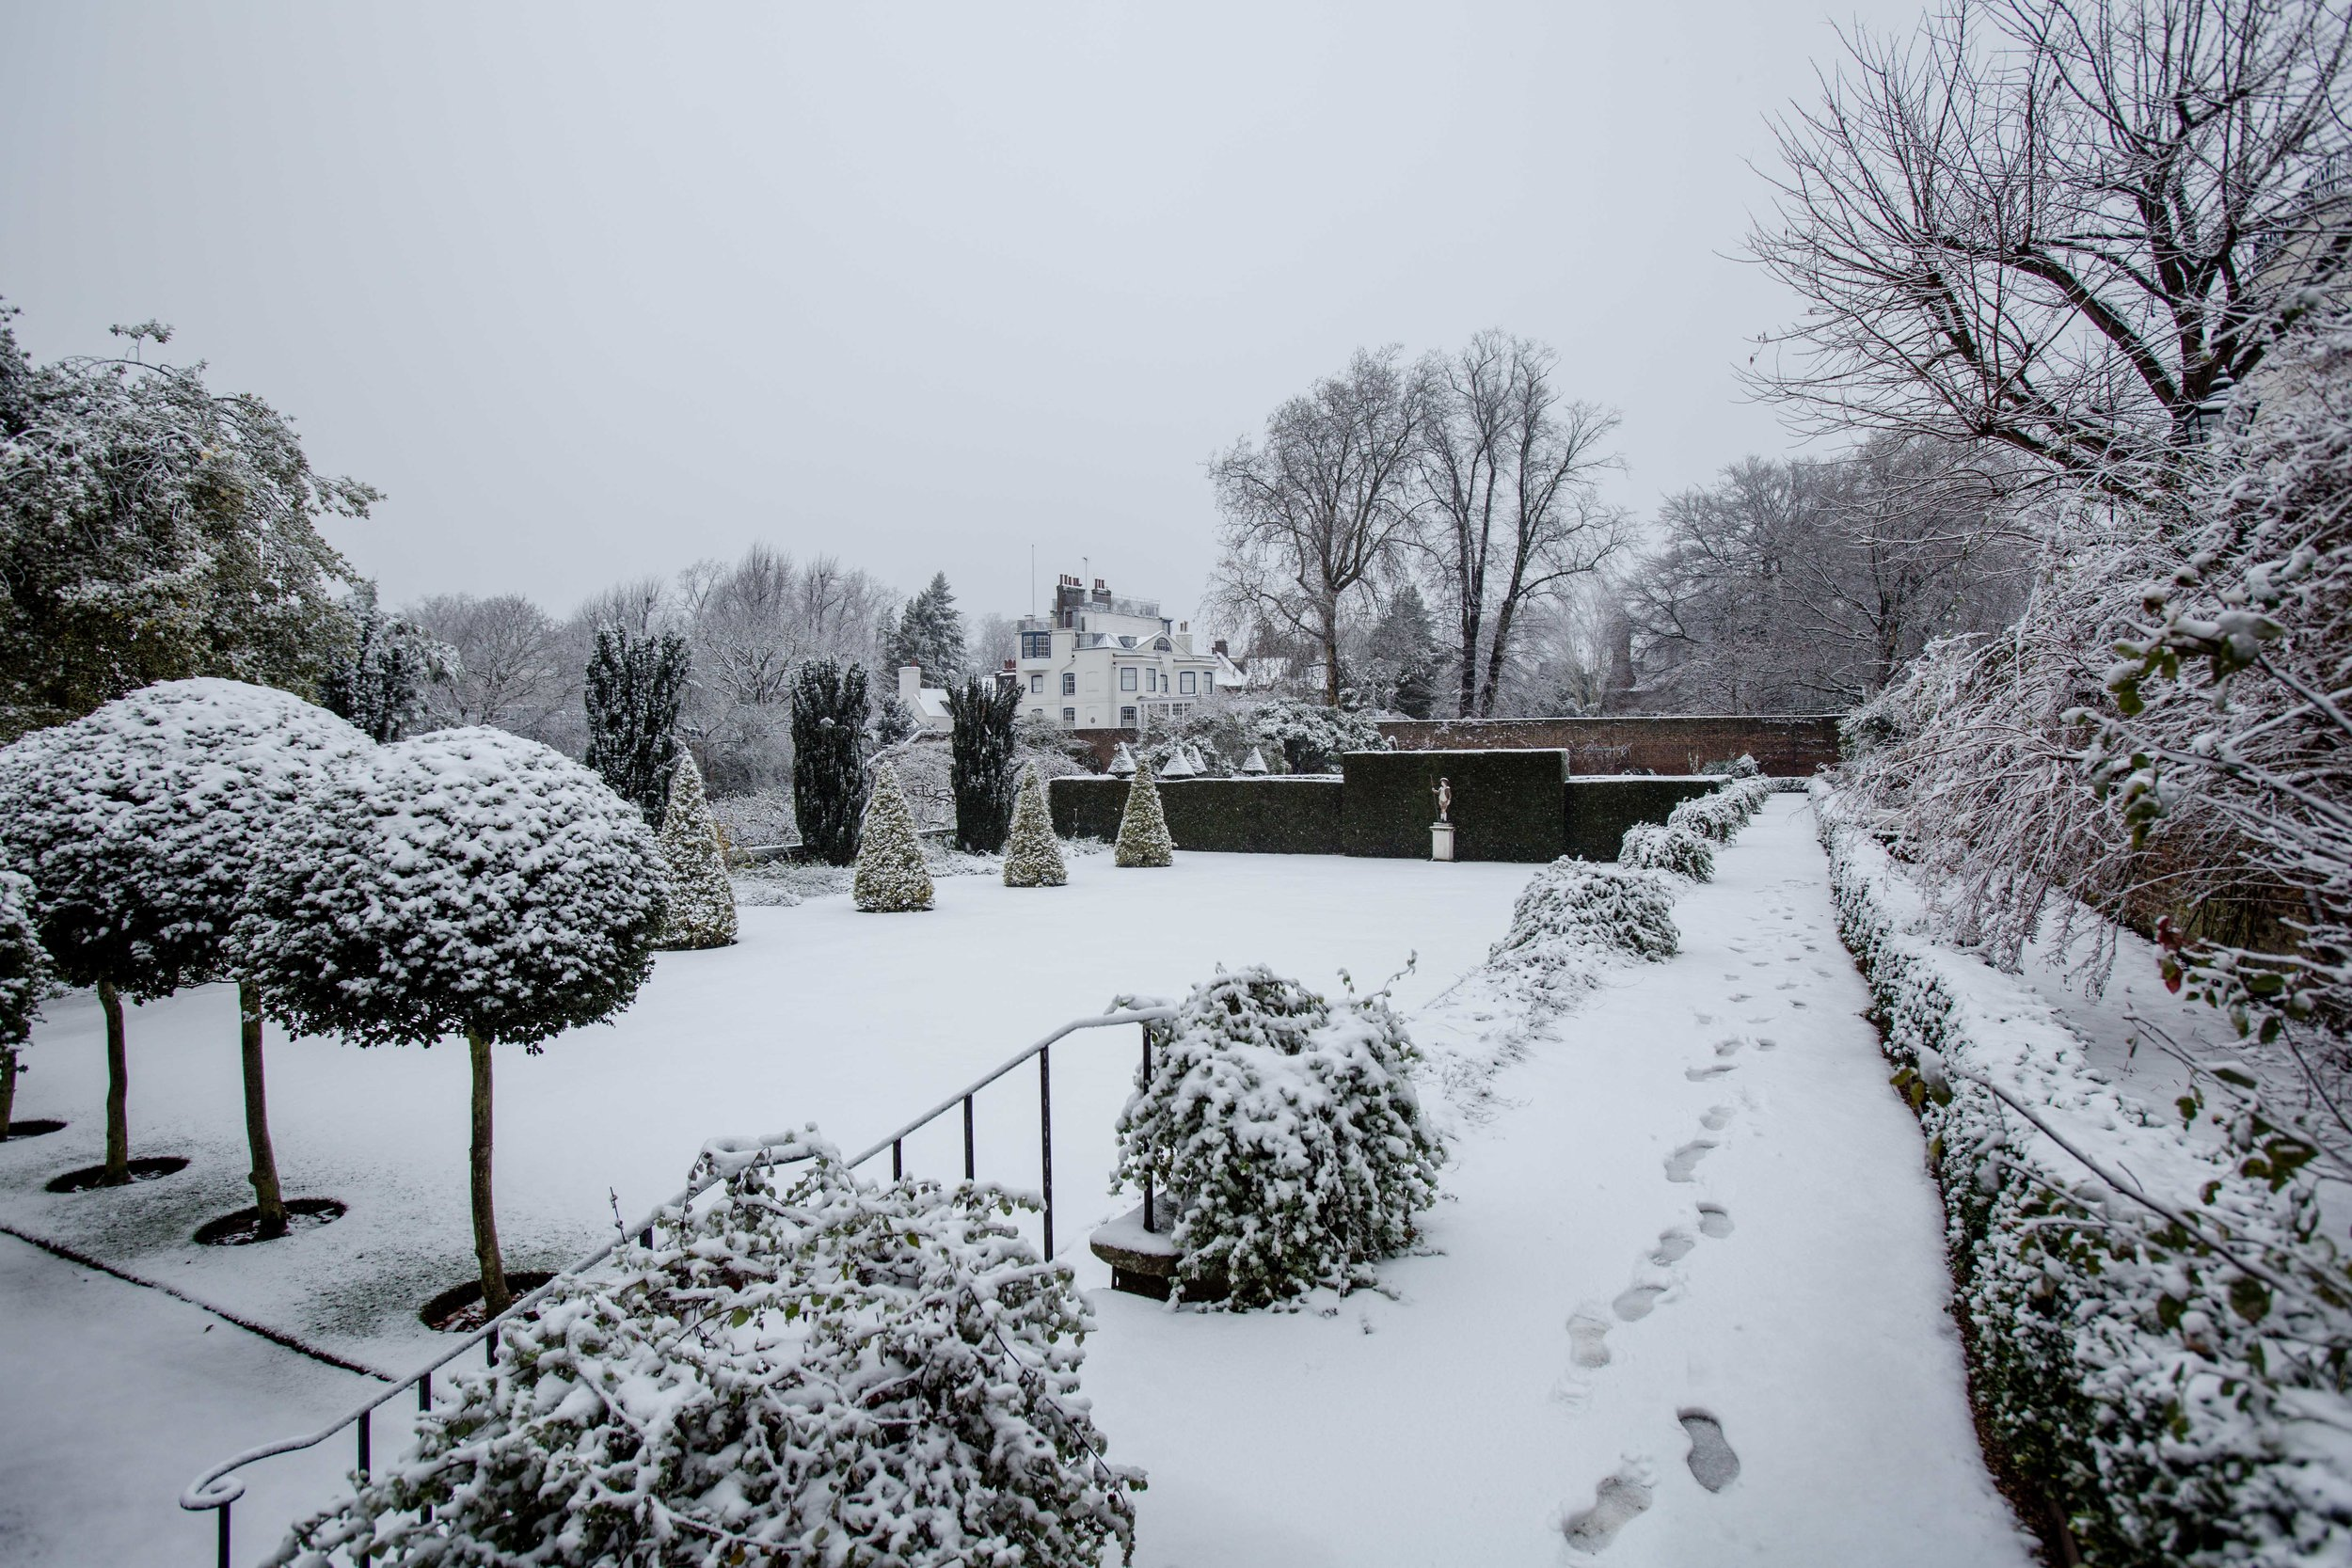 hampstead snow London 2017 Diana von r fenton house